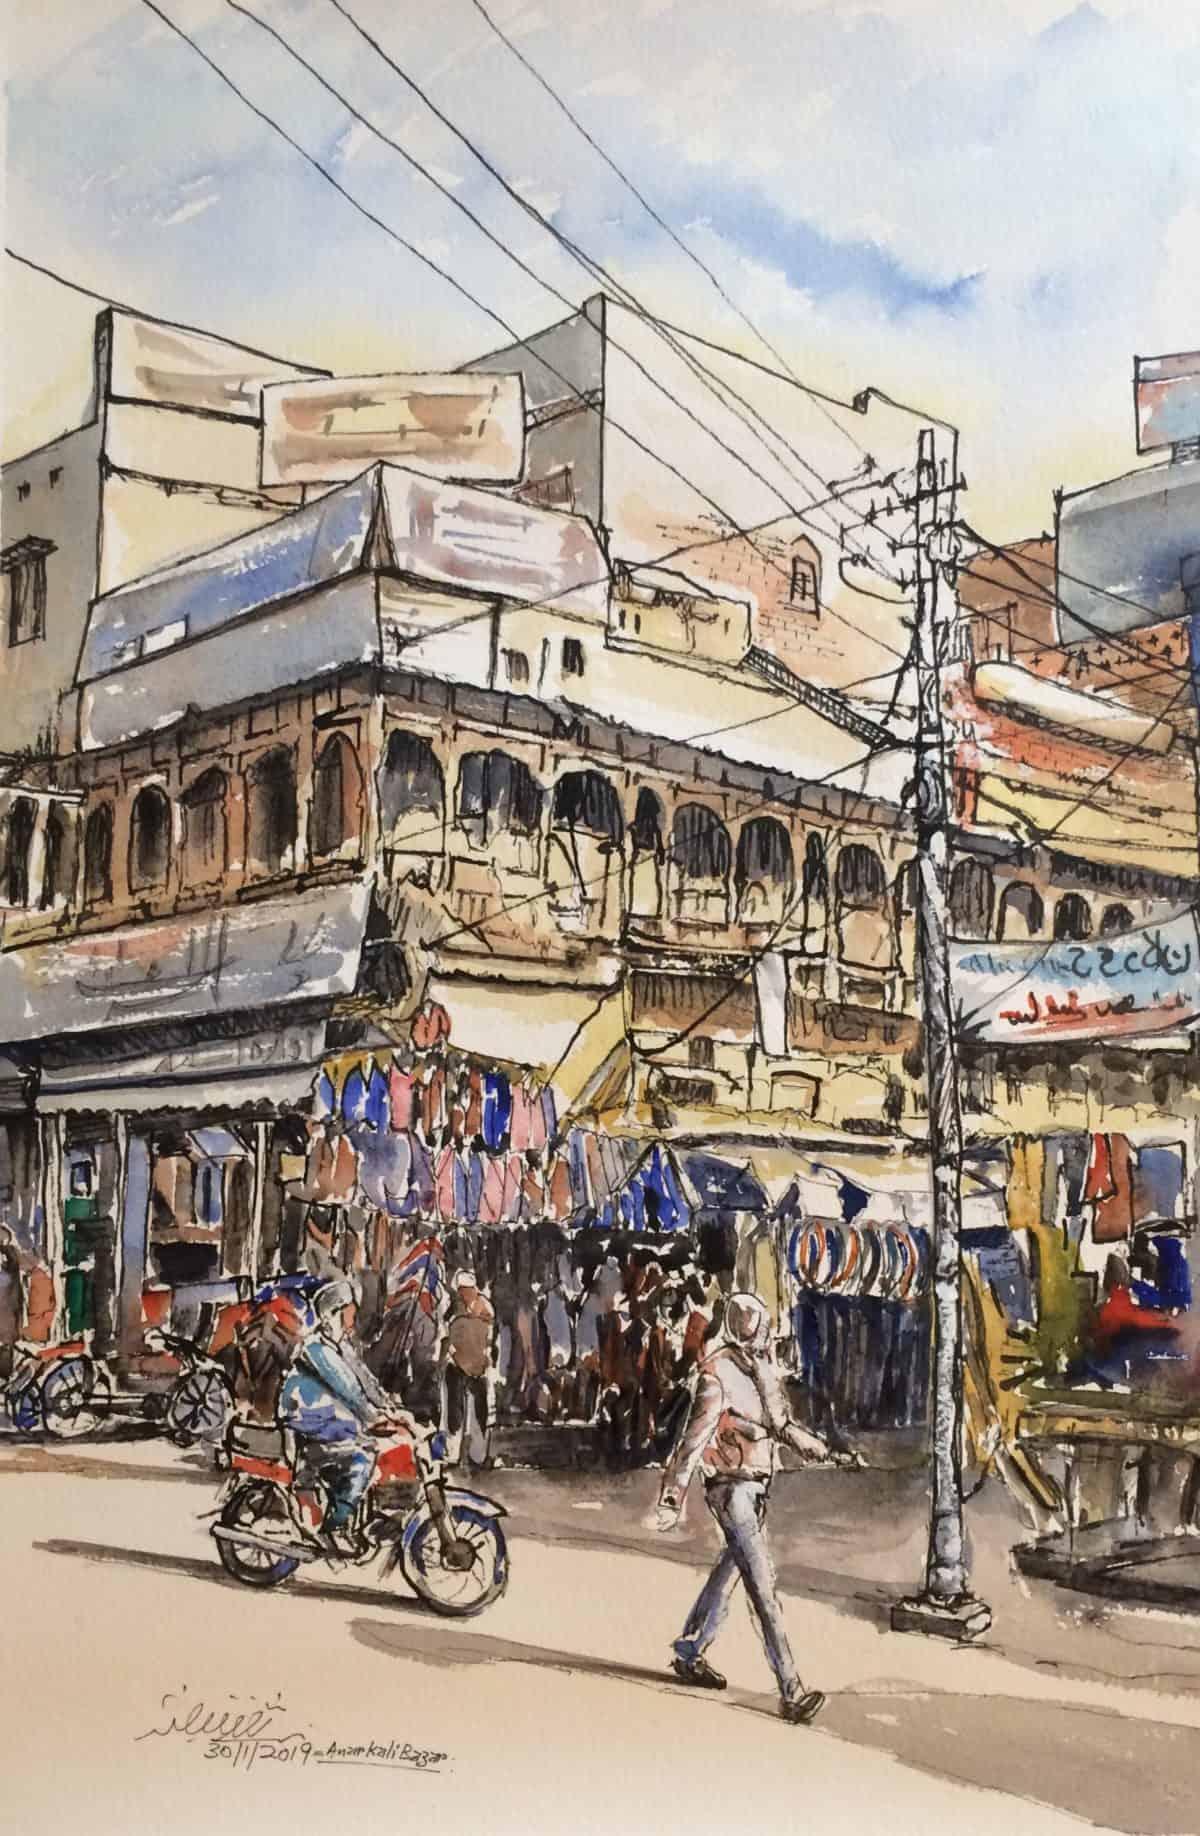 Anarkali BazarChairing Cross